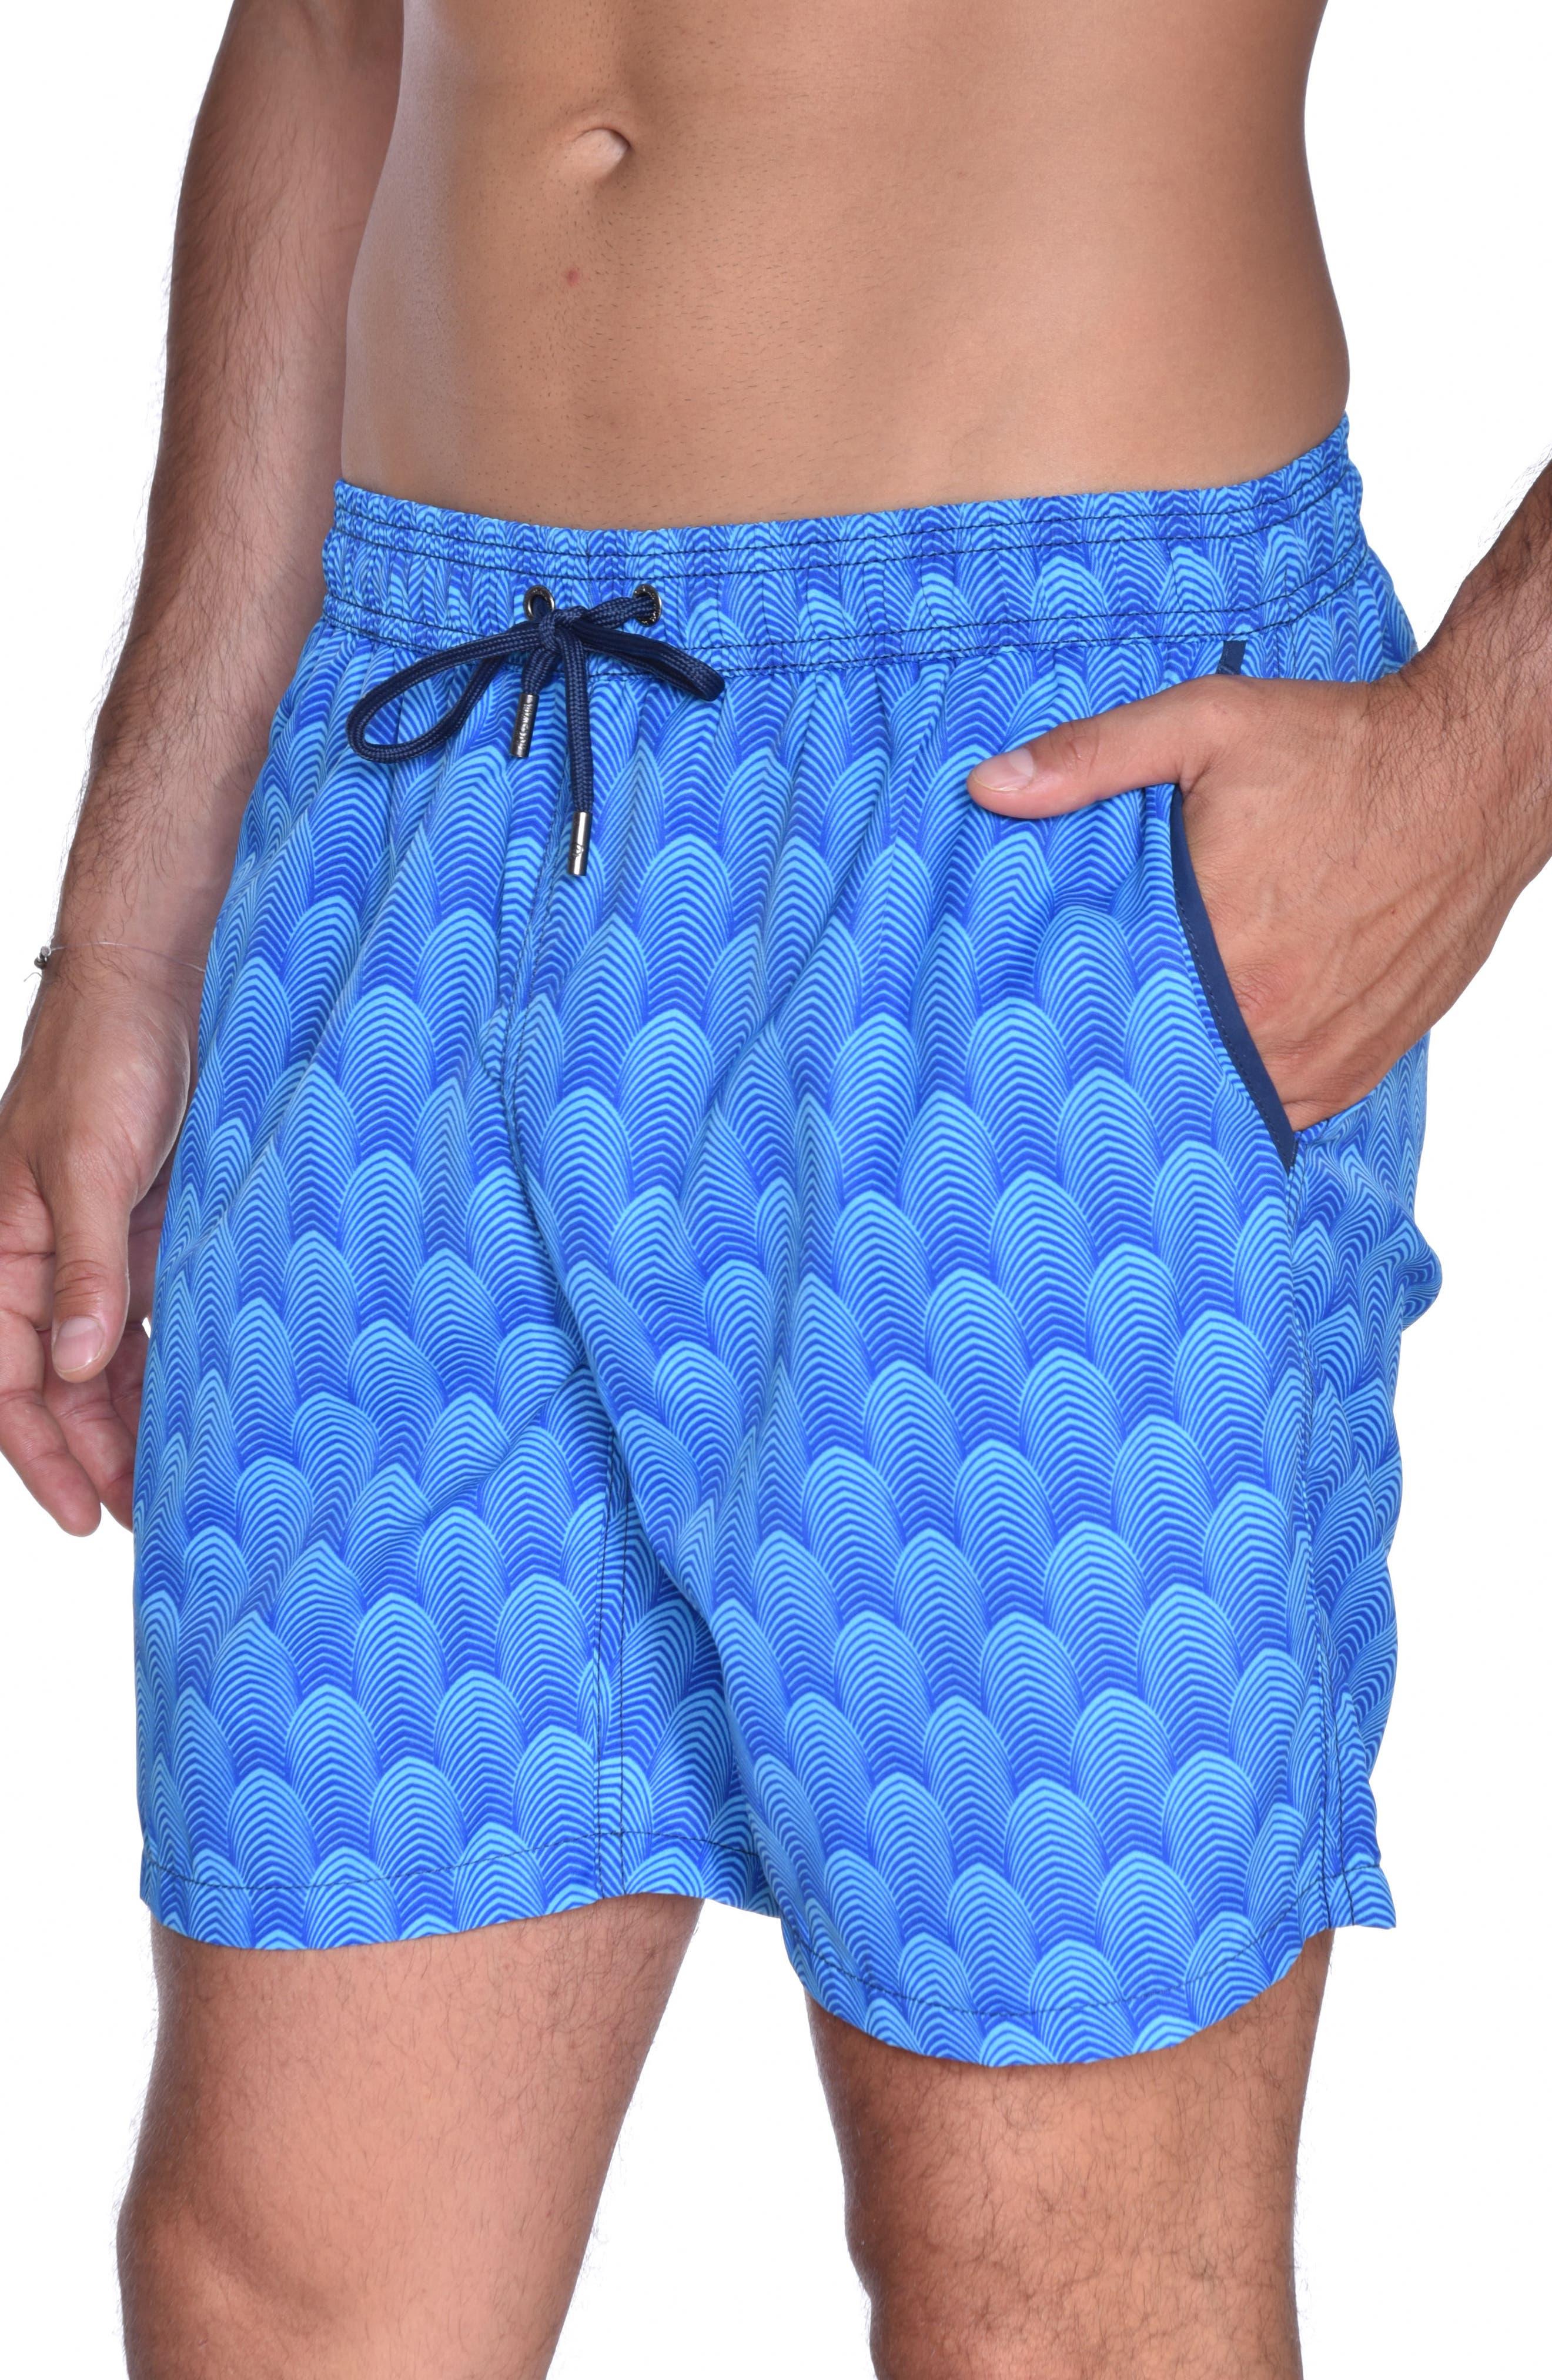 Mr. Swim Deco Print Swim Trunks,                             Alternate thumbnail 5, color,